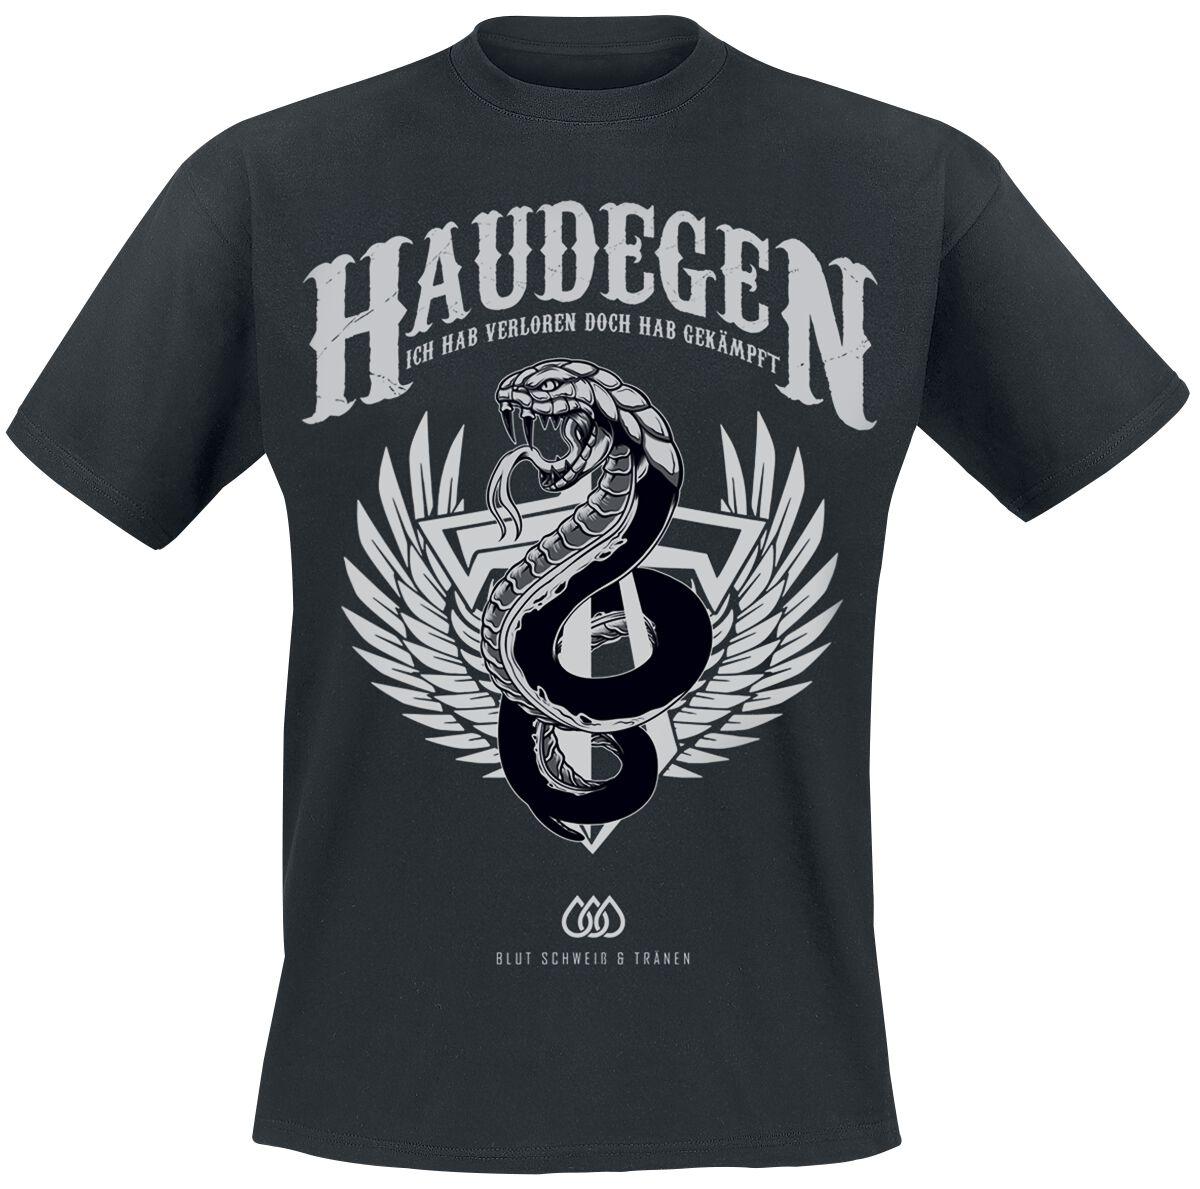 Zespoły - Koszulki - T-Shirt Haudegen Blut Schweiß und Tränen T-Shirt czarny - 364403